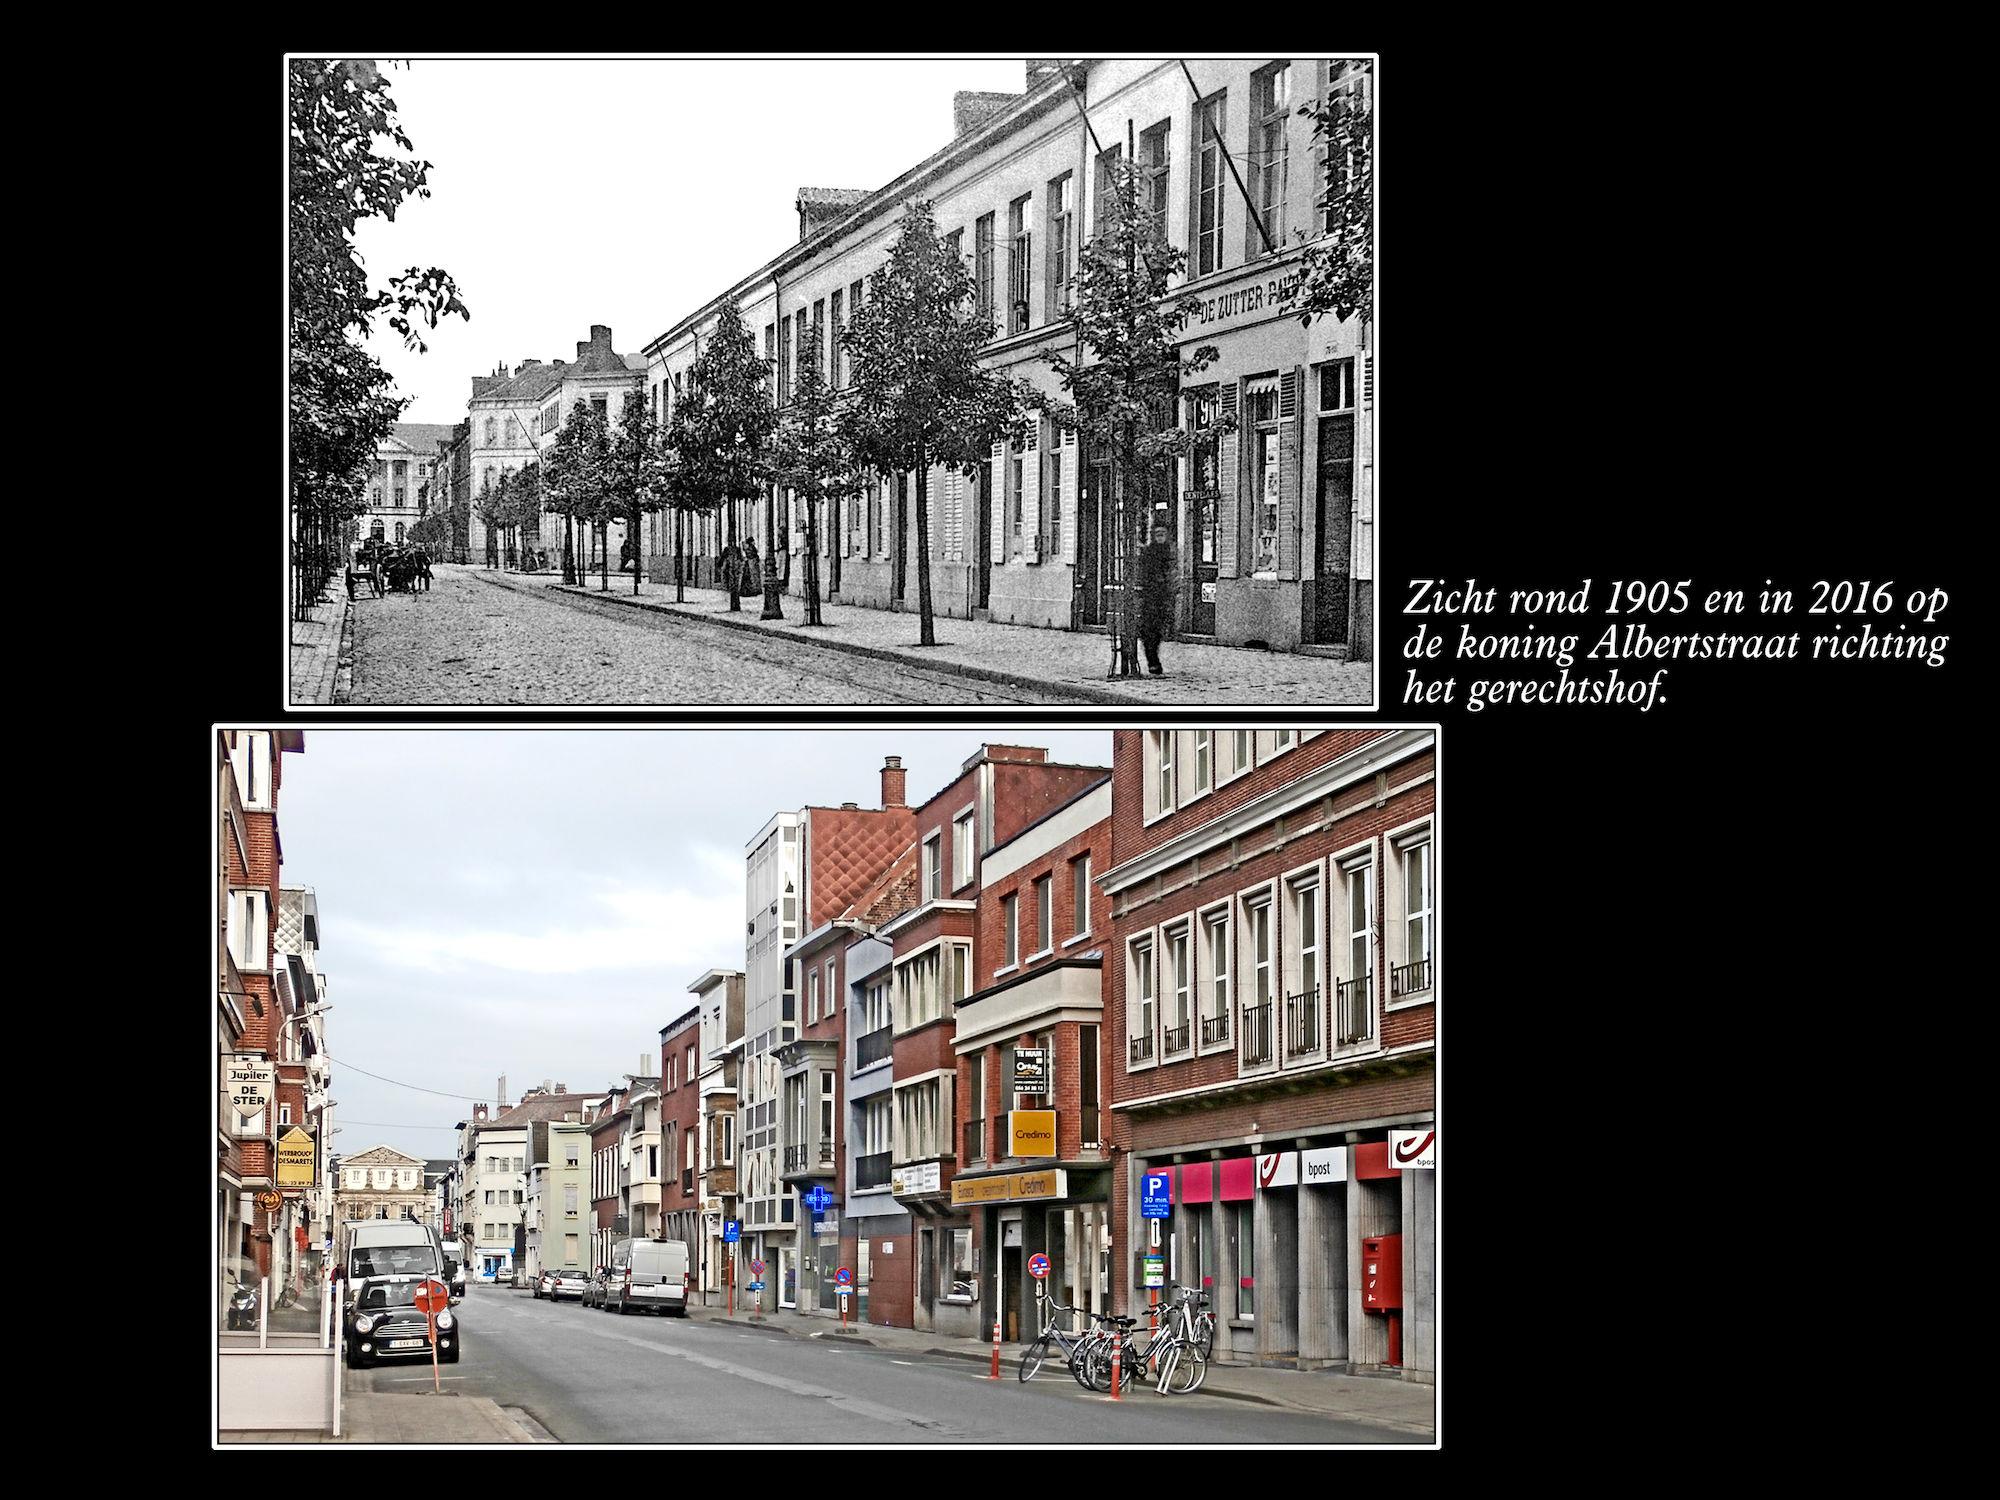 6144 Koning Albertstraat ca 1905 en 2016